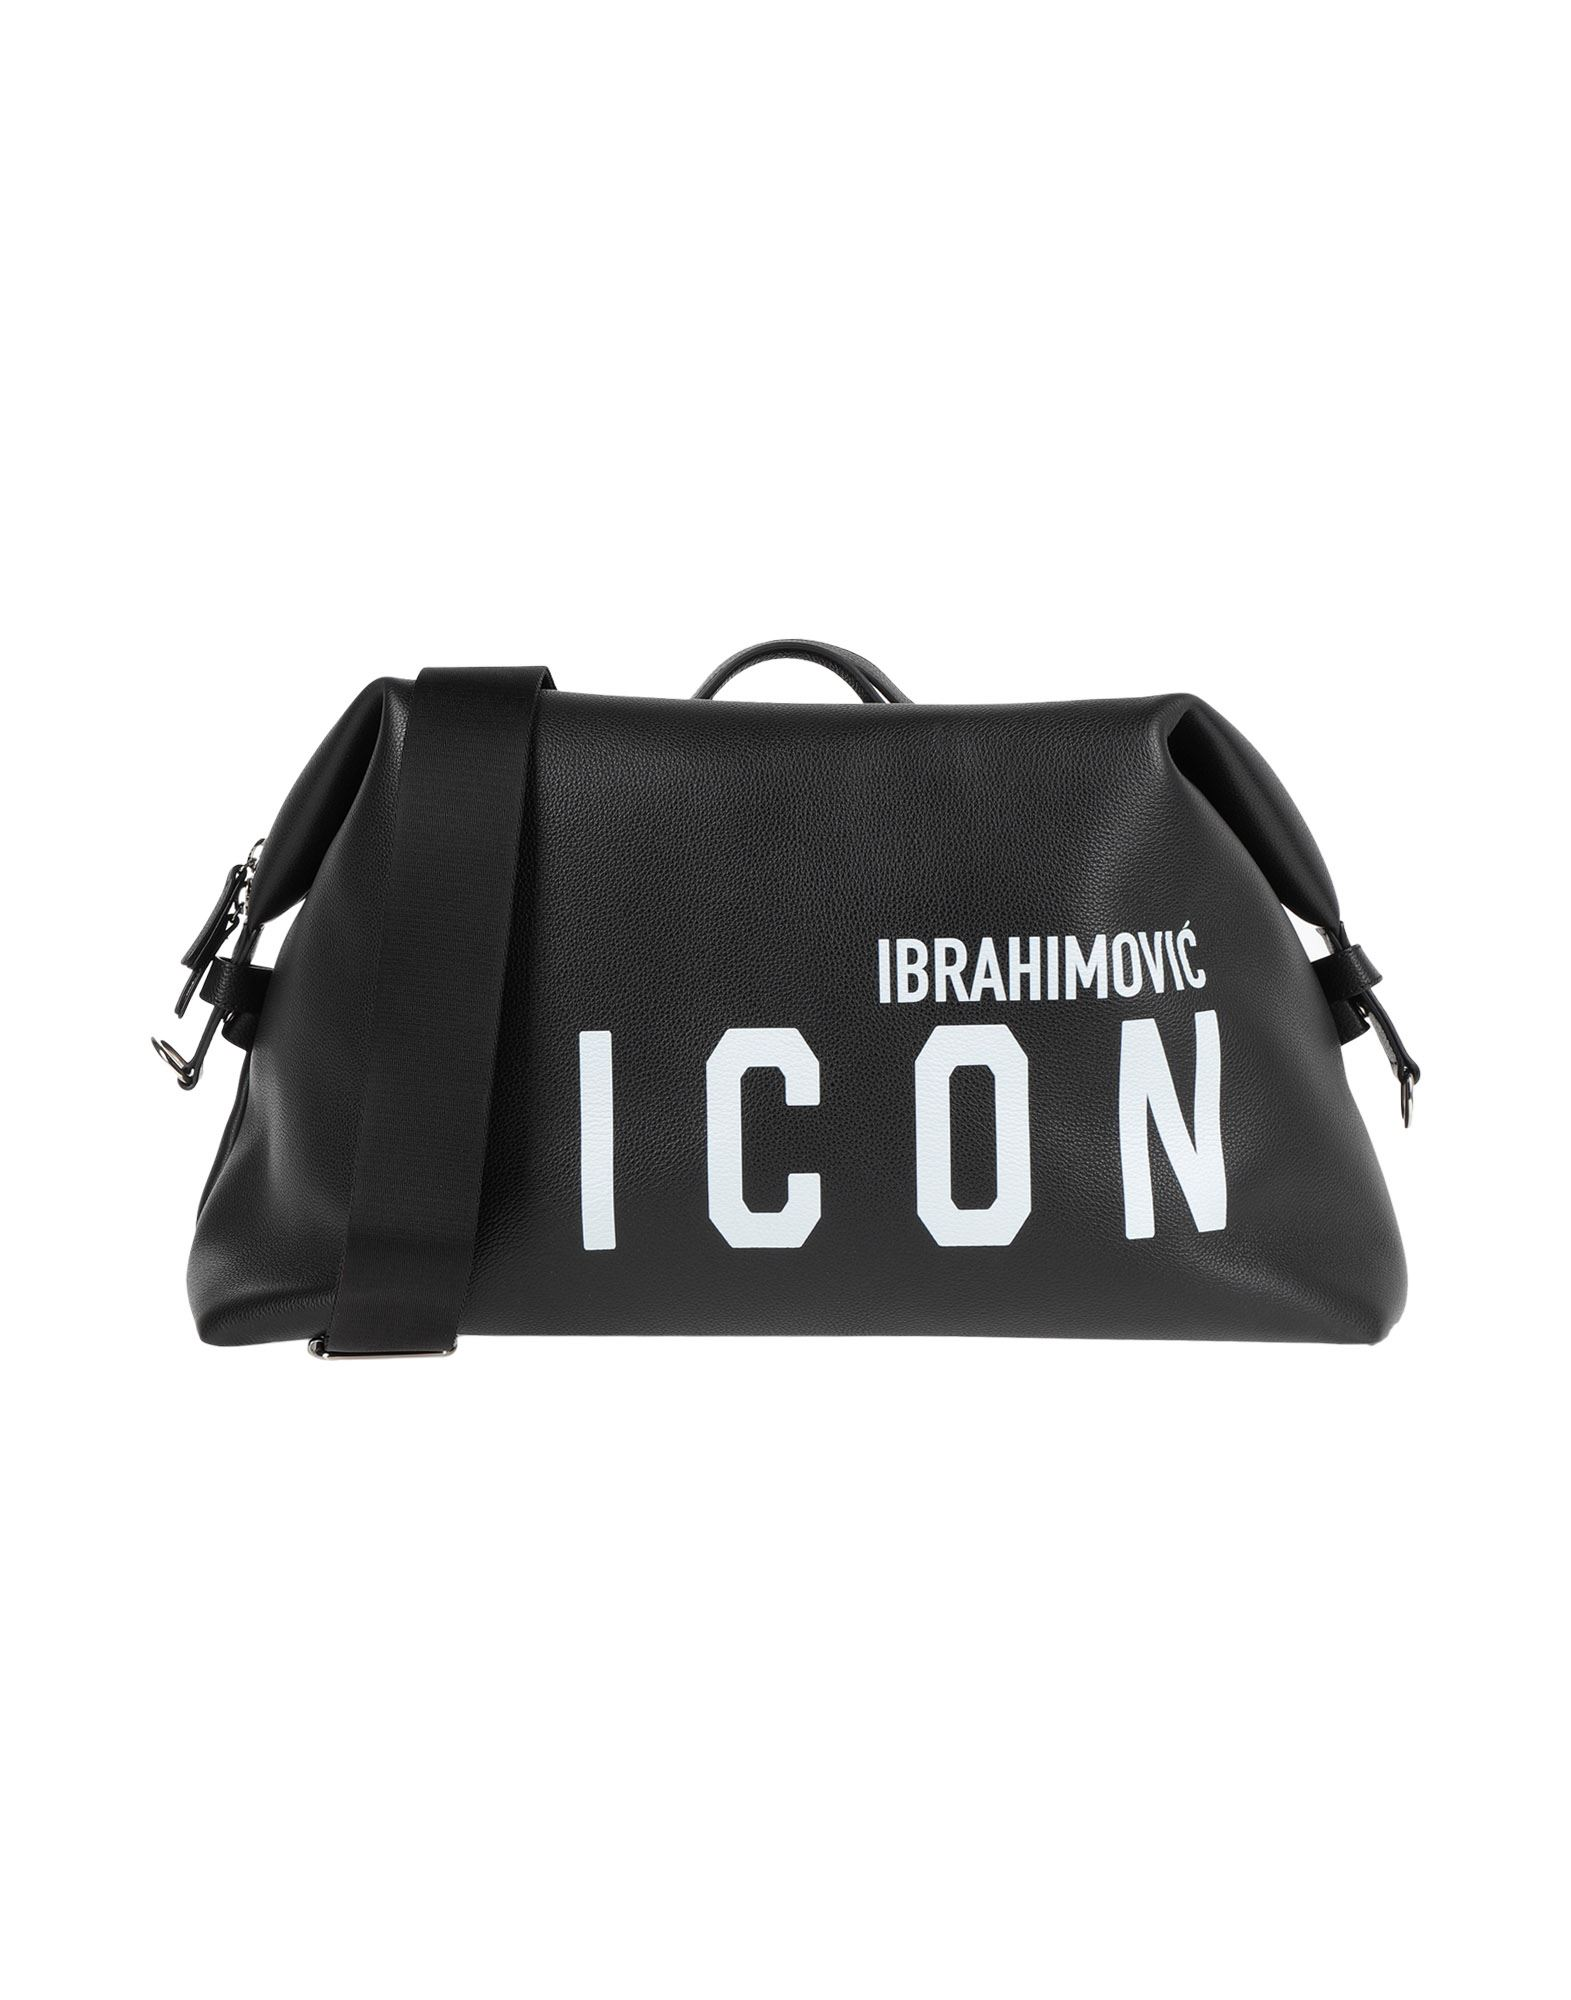 DSQUARED2 Travel duffel bags - Item 45576211